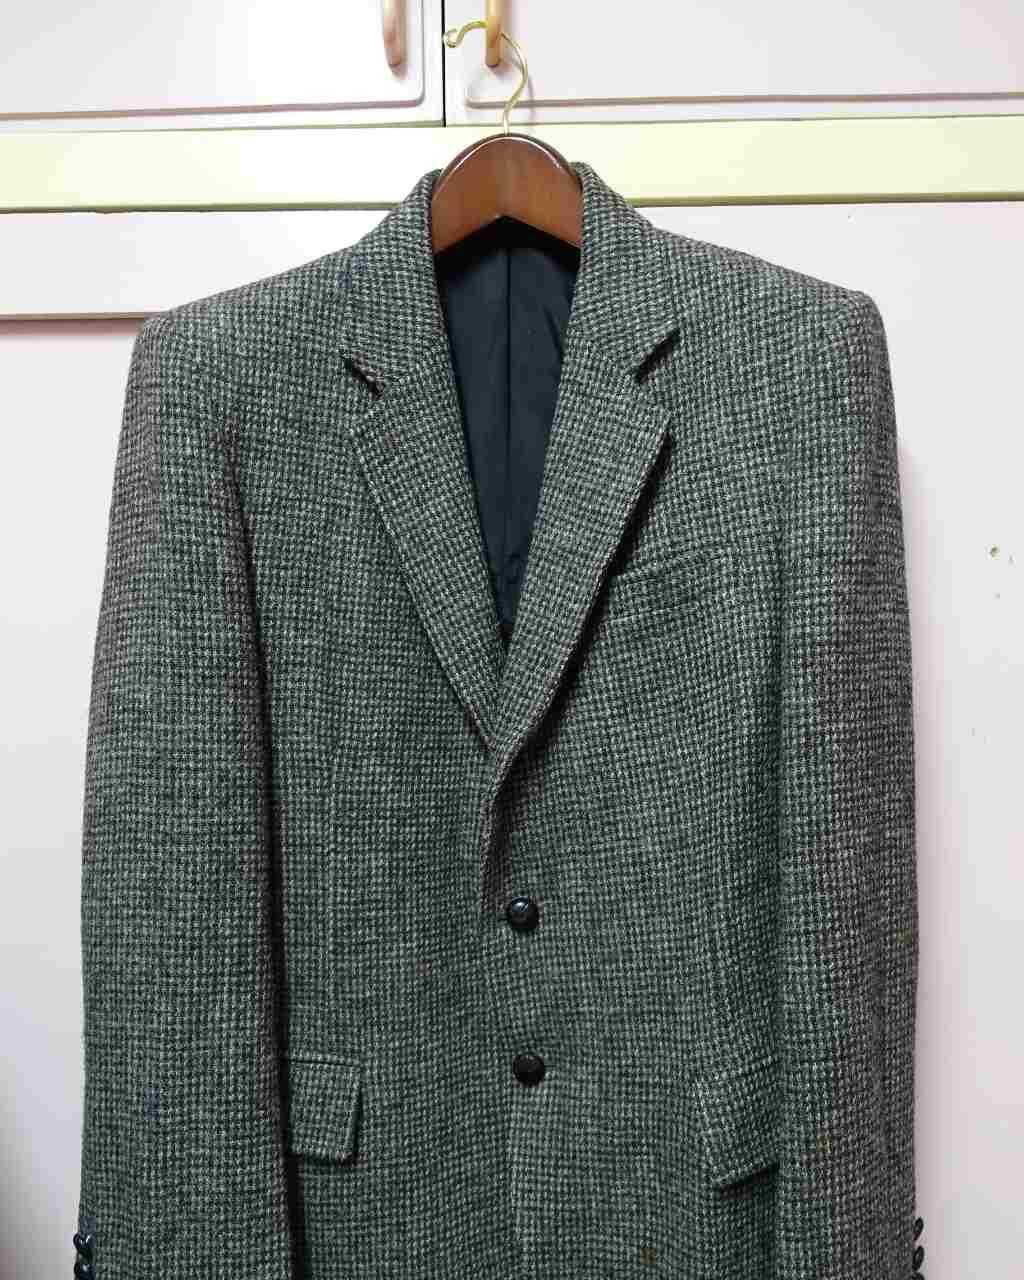 Jacket Hanger Luxury Suit Hangers From Kirby Allison's Hanger Project